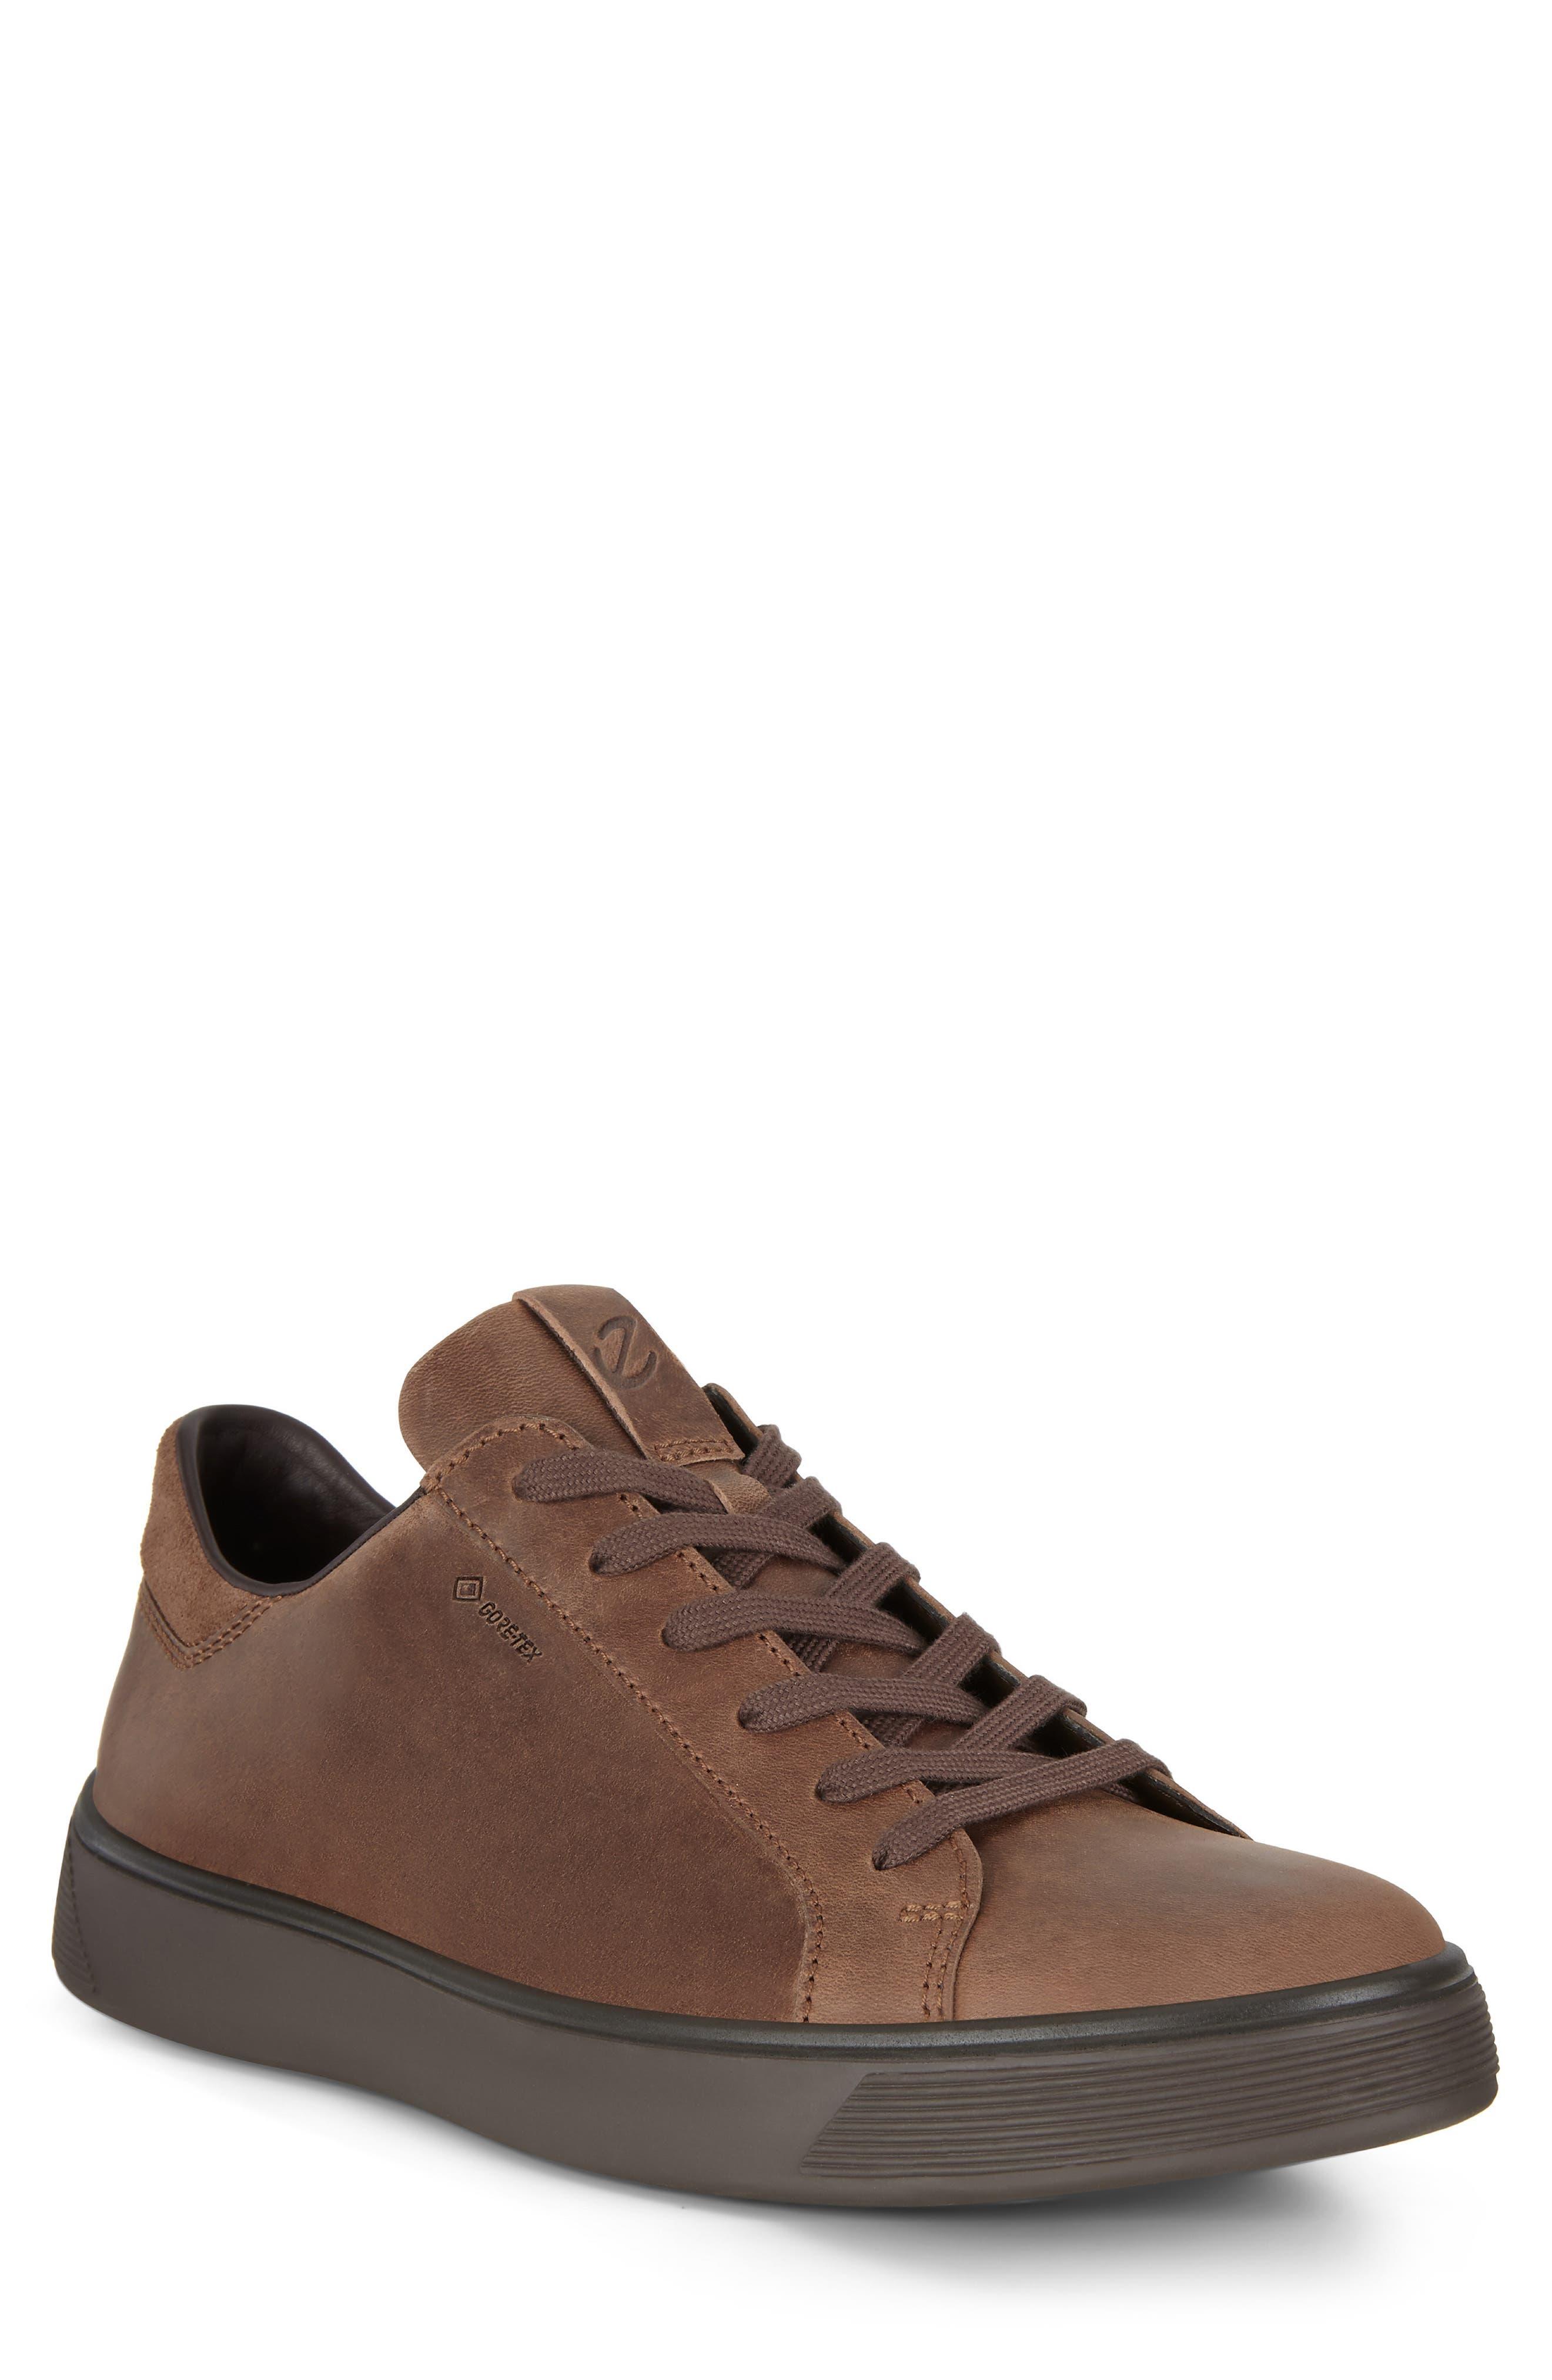 Men's Ecco Street Tray Gtx Gore-Tex Waterproof Sneaker